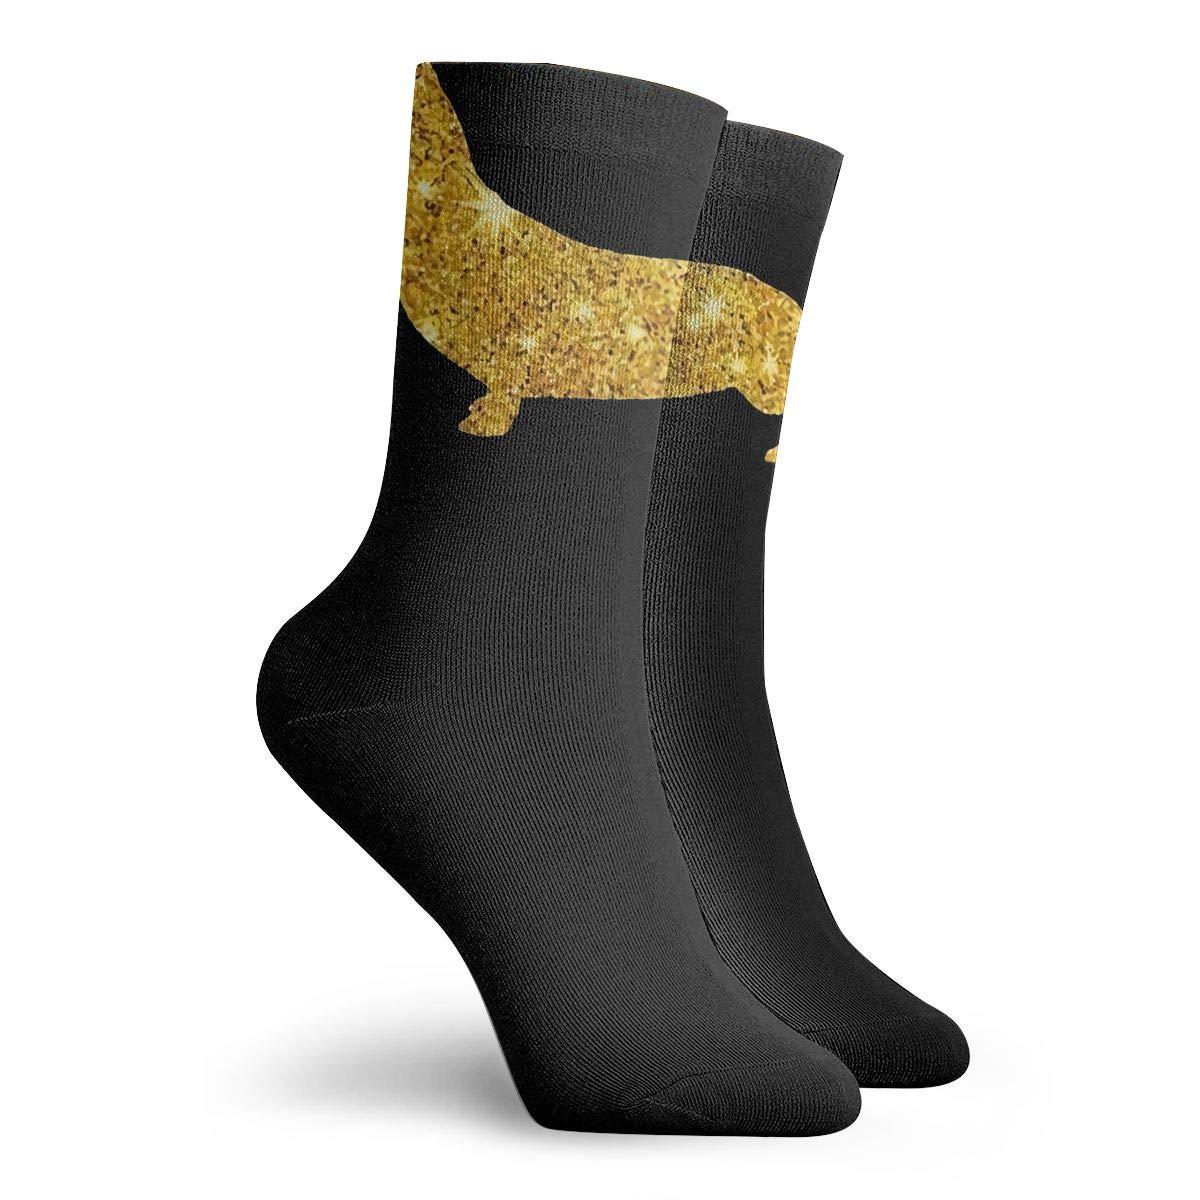 Gold Daschund Dog Fashion Dress Socks Short Socks Leisure Travel 11.8 Inch